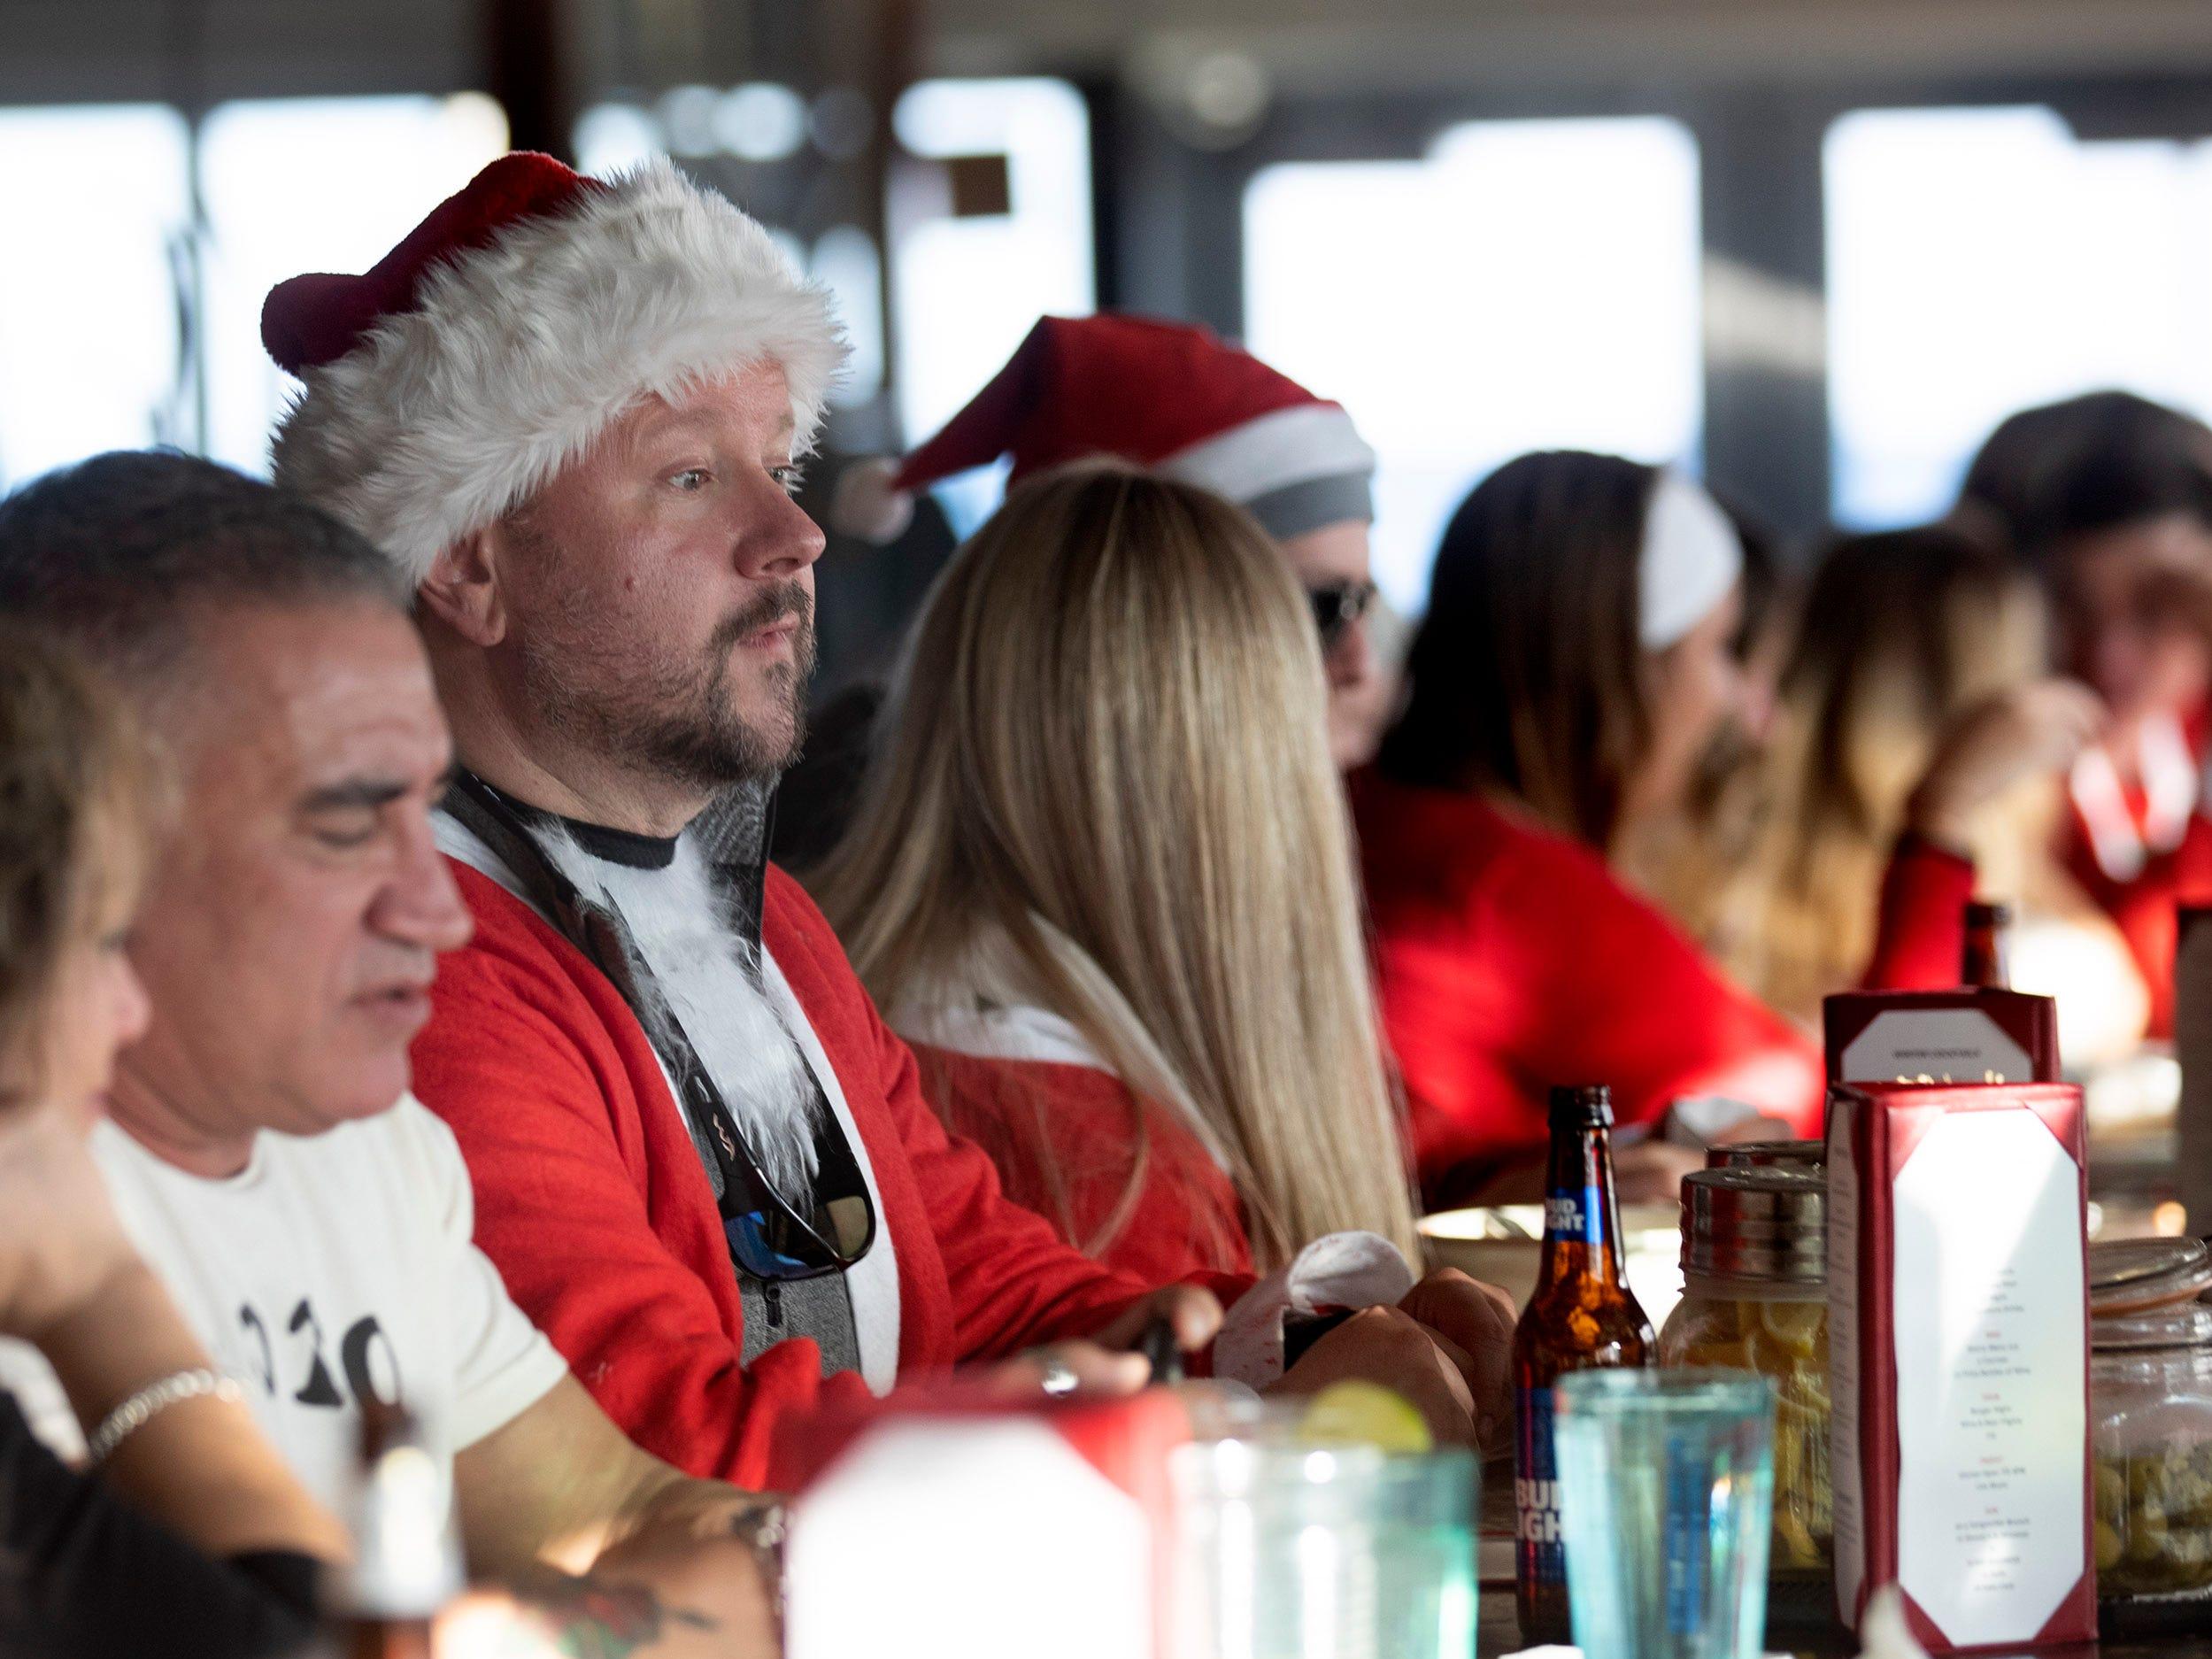 Patrons at the Langosta Lounge during SantaCon Bar Crawl through Asbury Park on December 8, 2018.